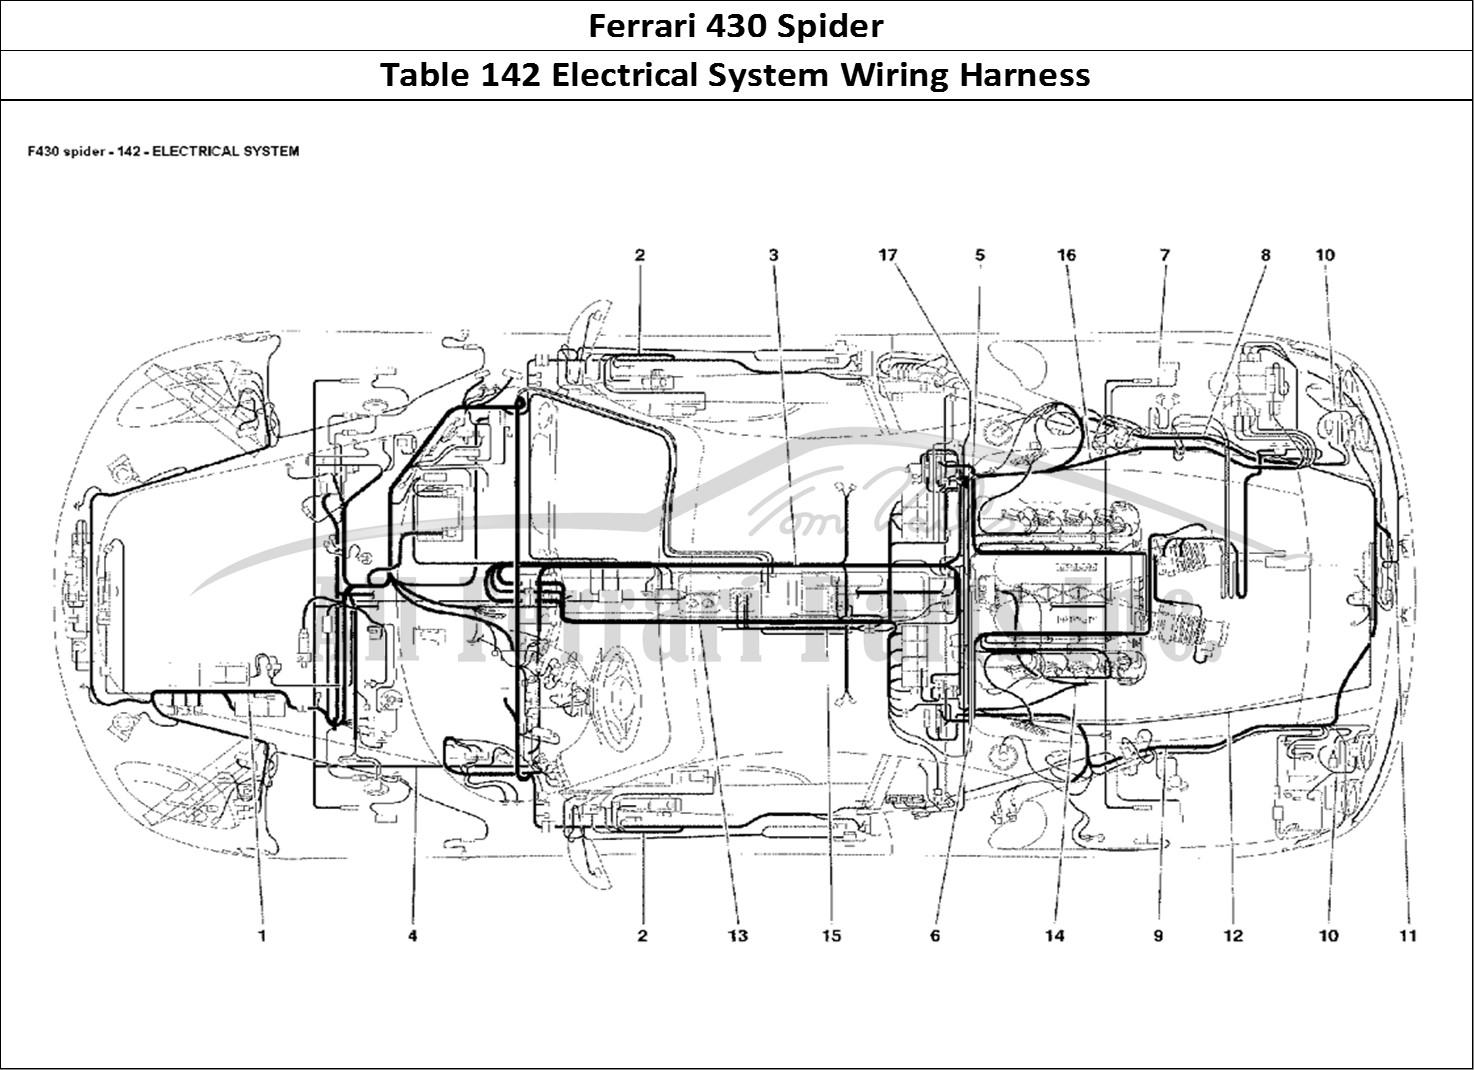 Buy Original Ferrari 430 Spider 142 Electrical System